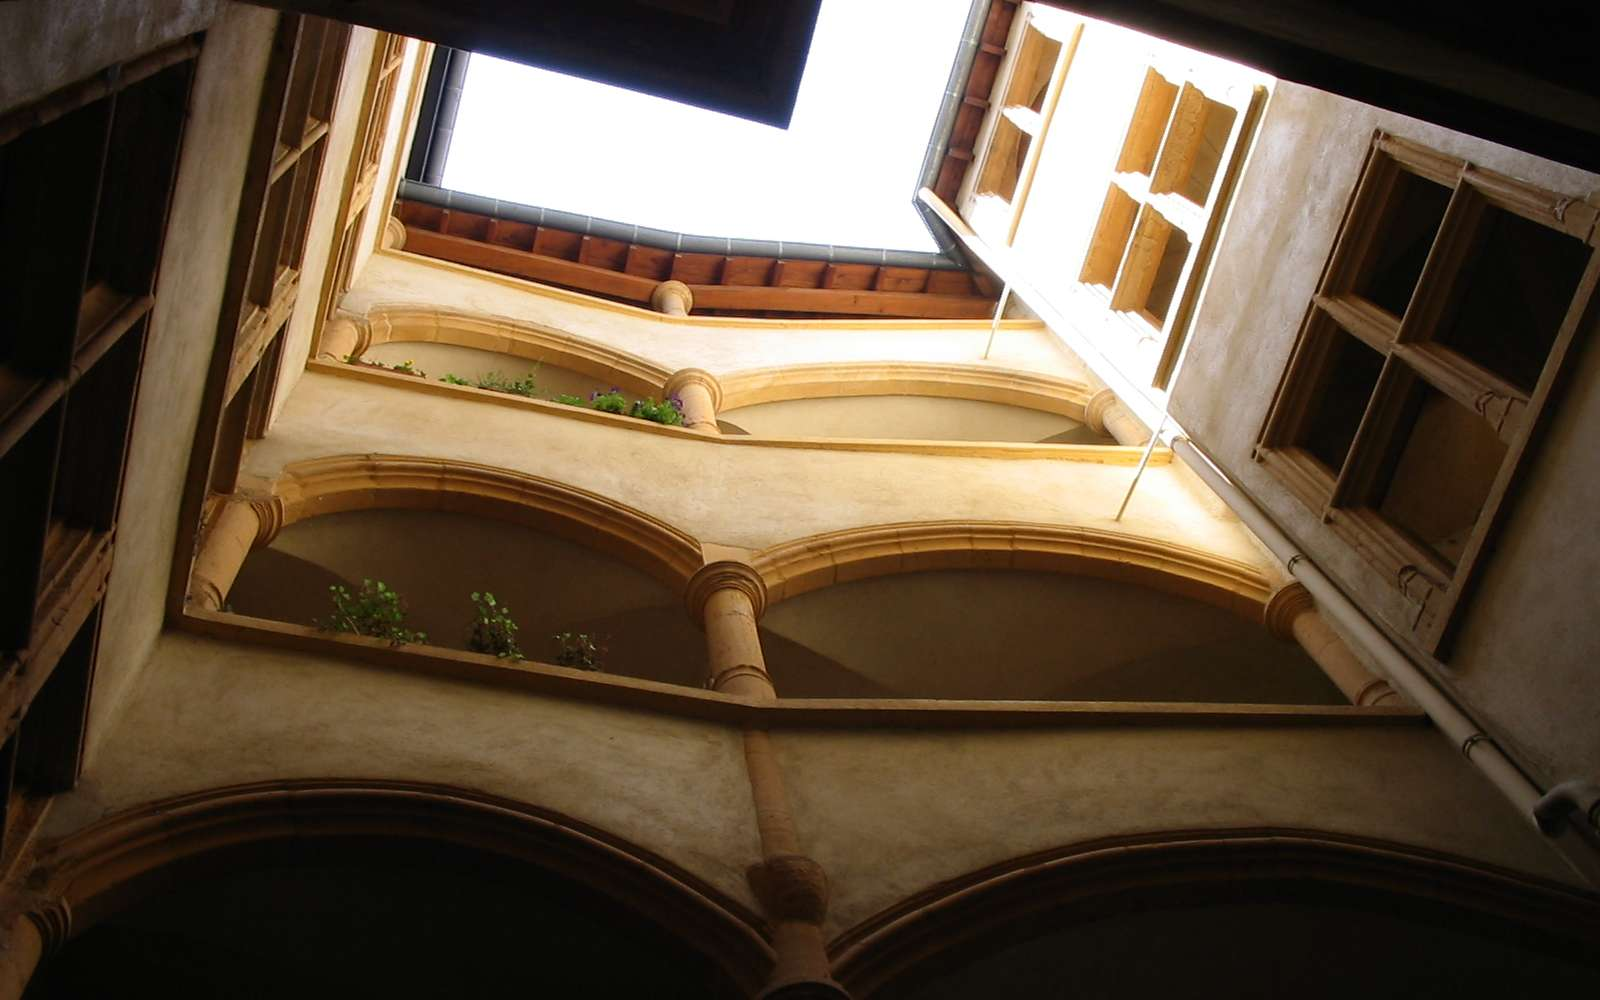 Traboules de Lyon. © Tusco, Wikipédia, CC by-sa 3.0